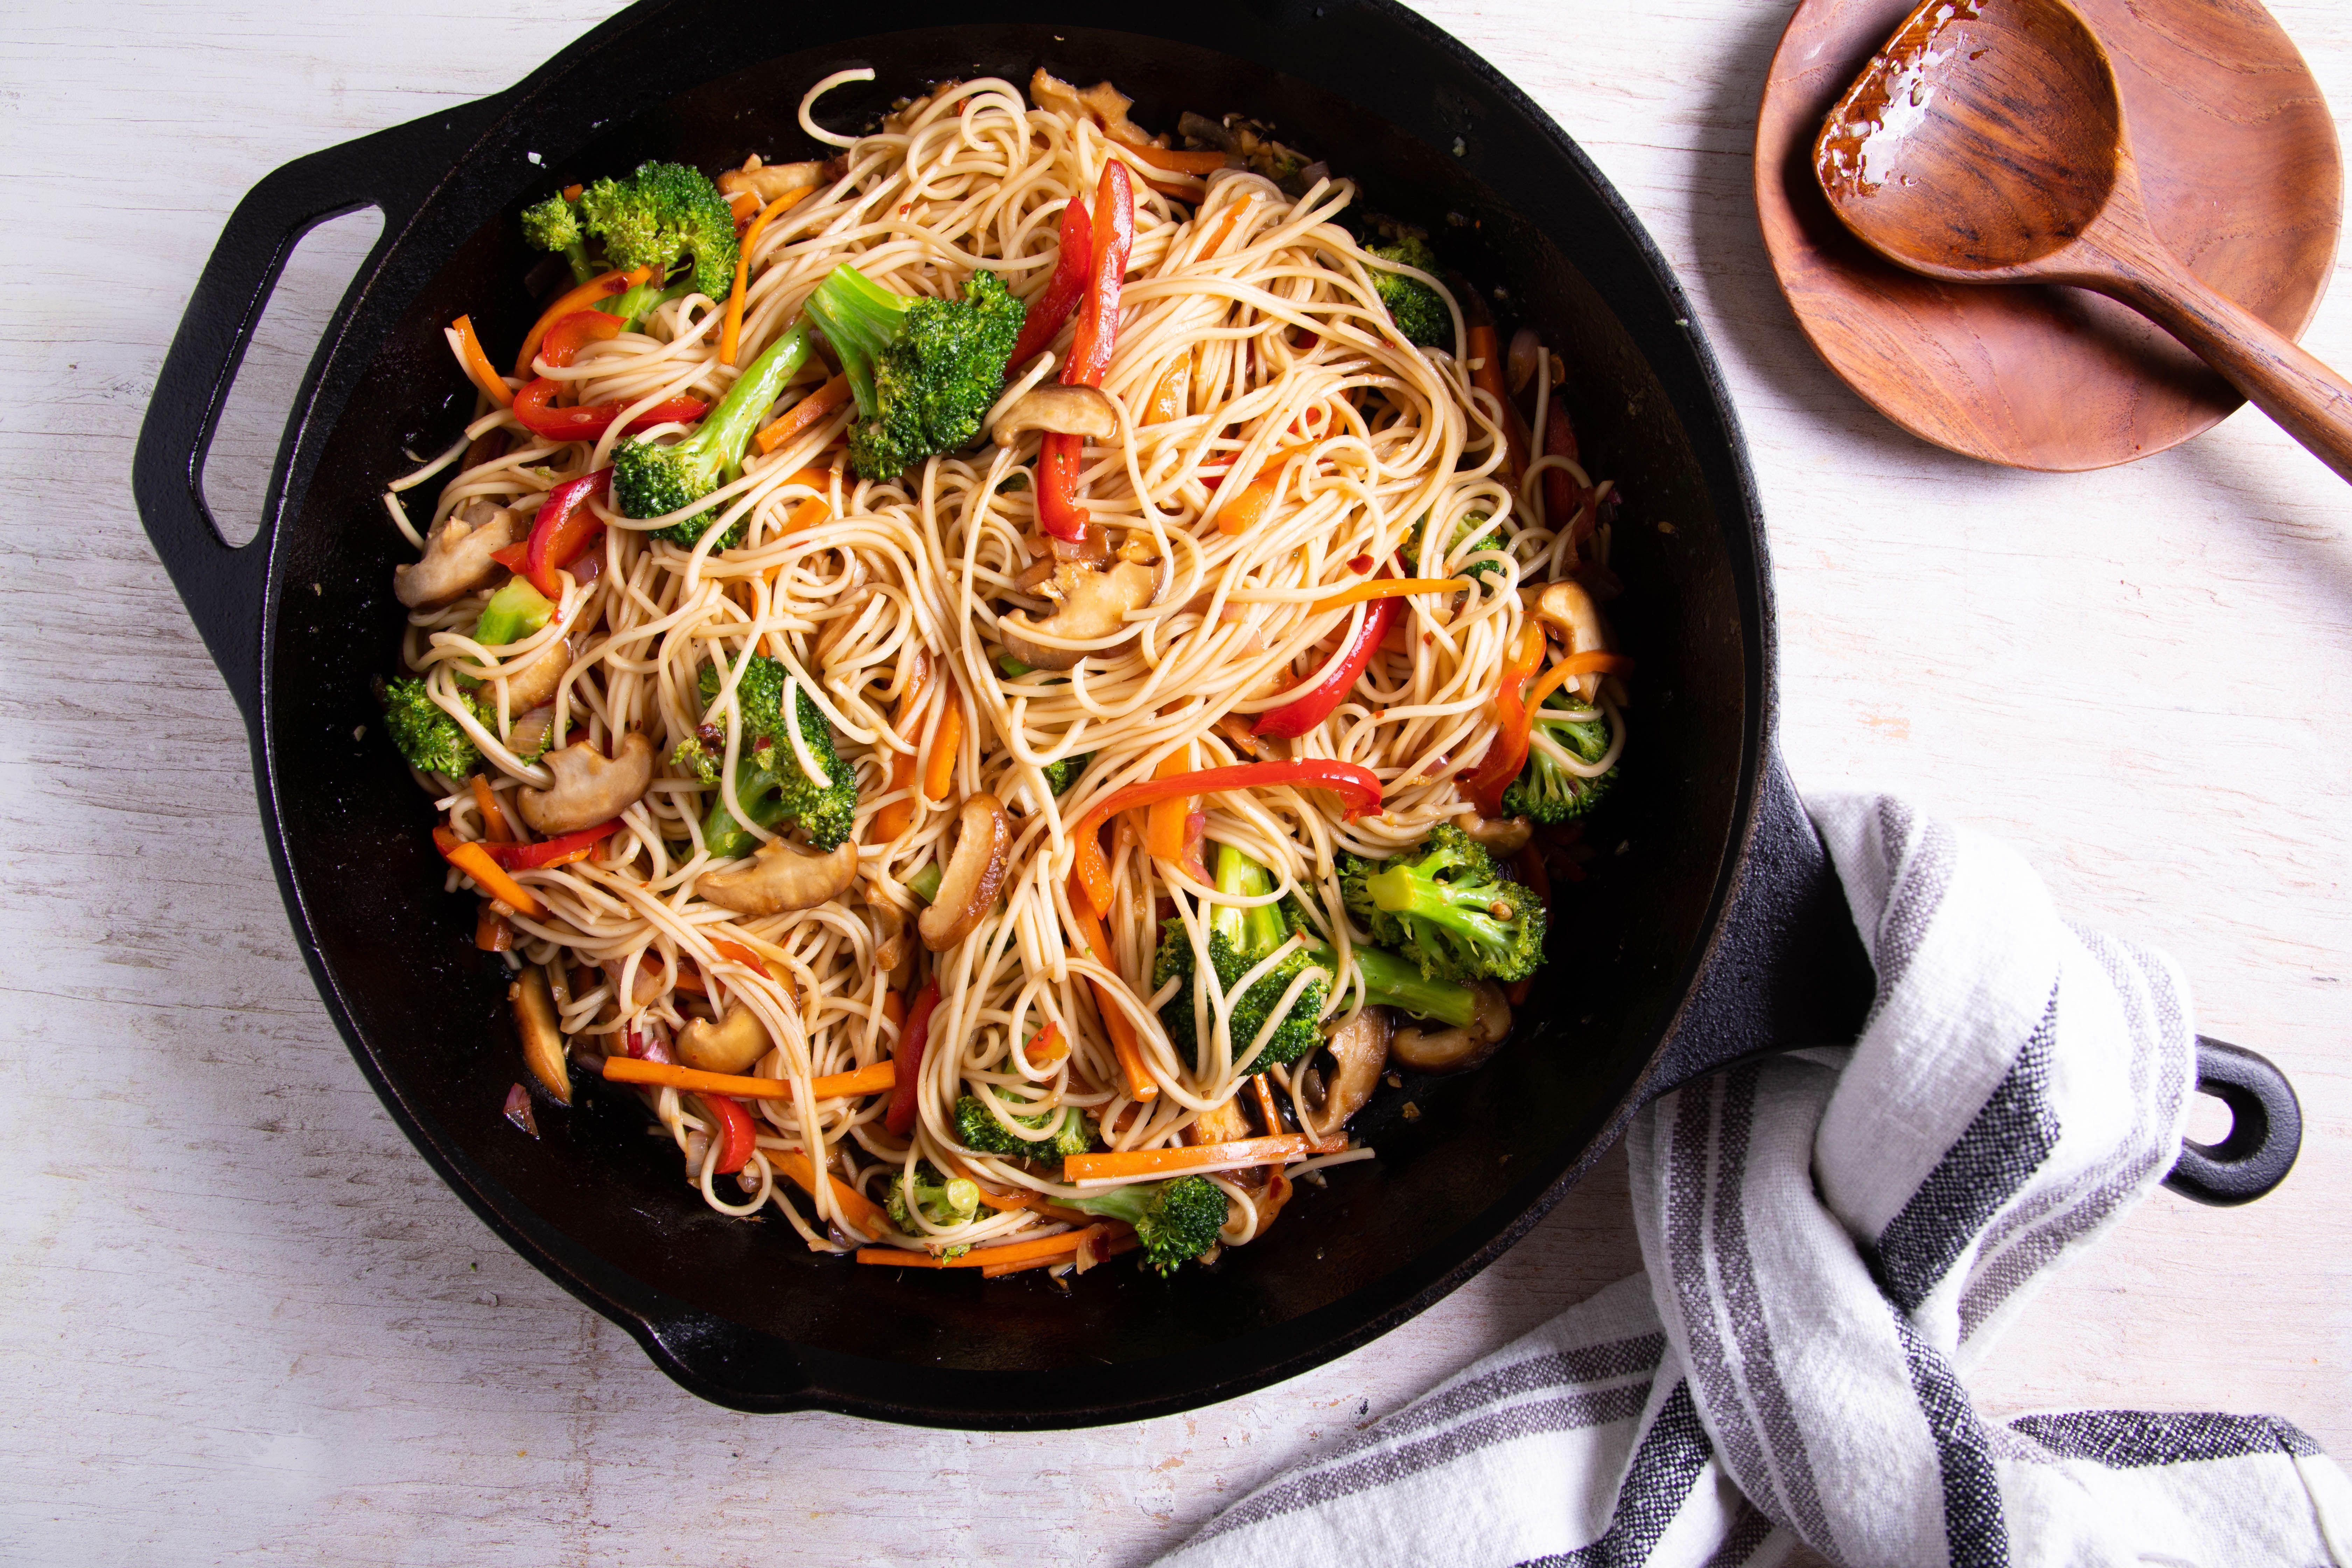 Ricetta Noodles Wok.Thai Stir Fried Noodles Recipe With Vegetables